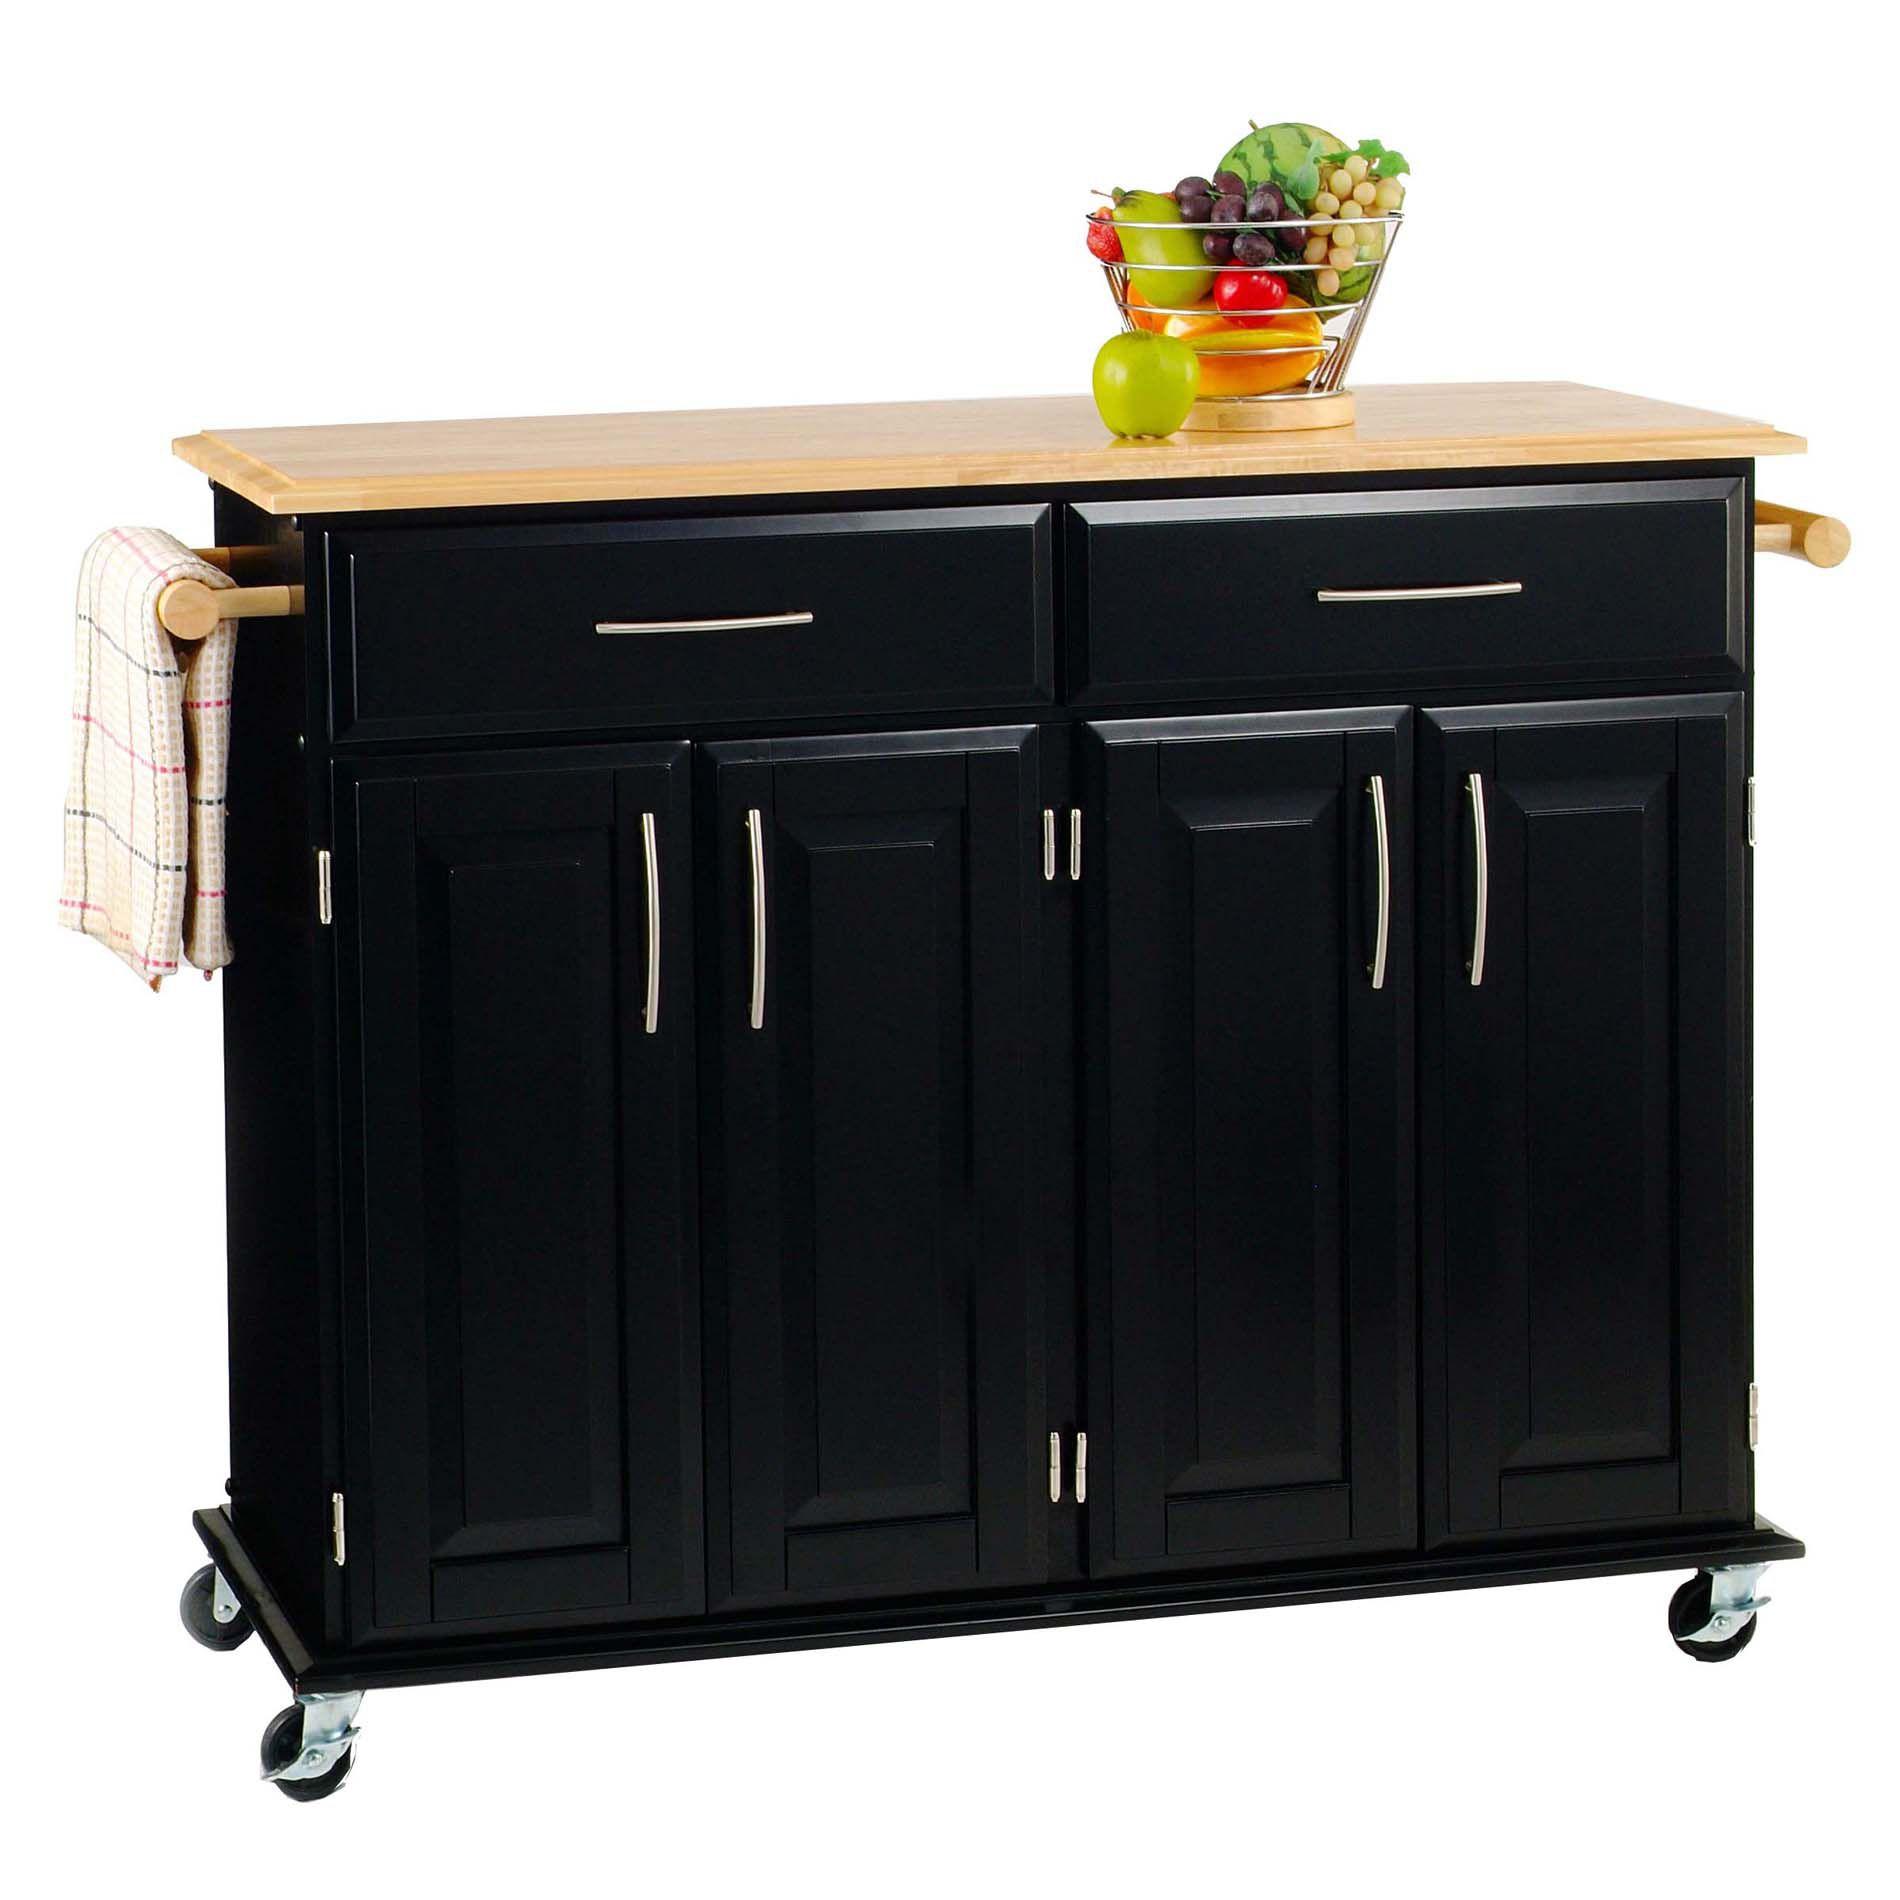 3512h x 4814w x 1814d solid wood top kitchen island cart